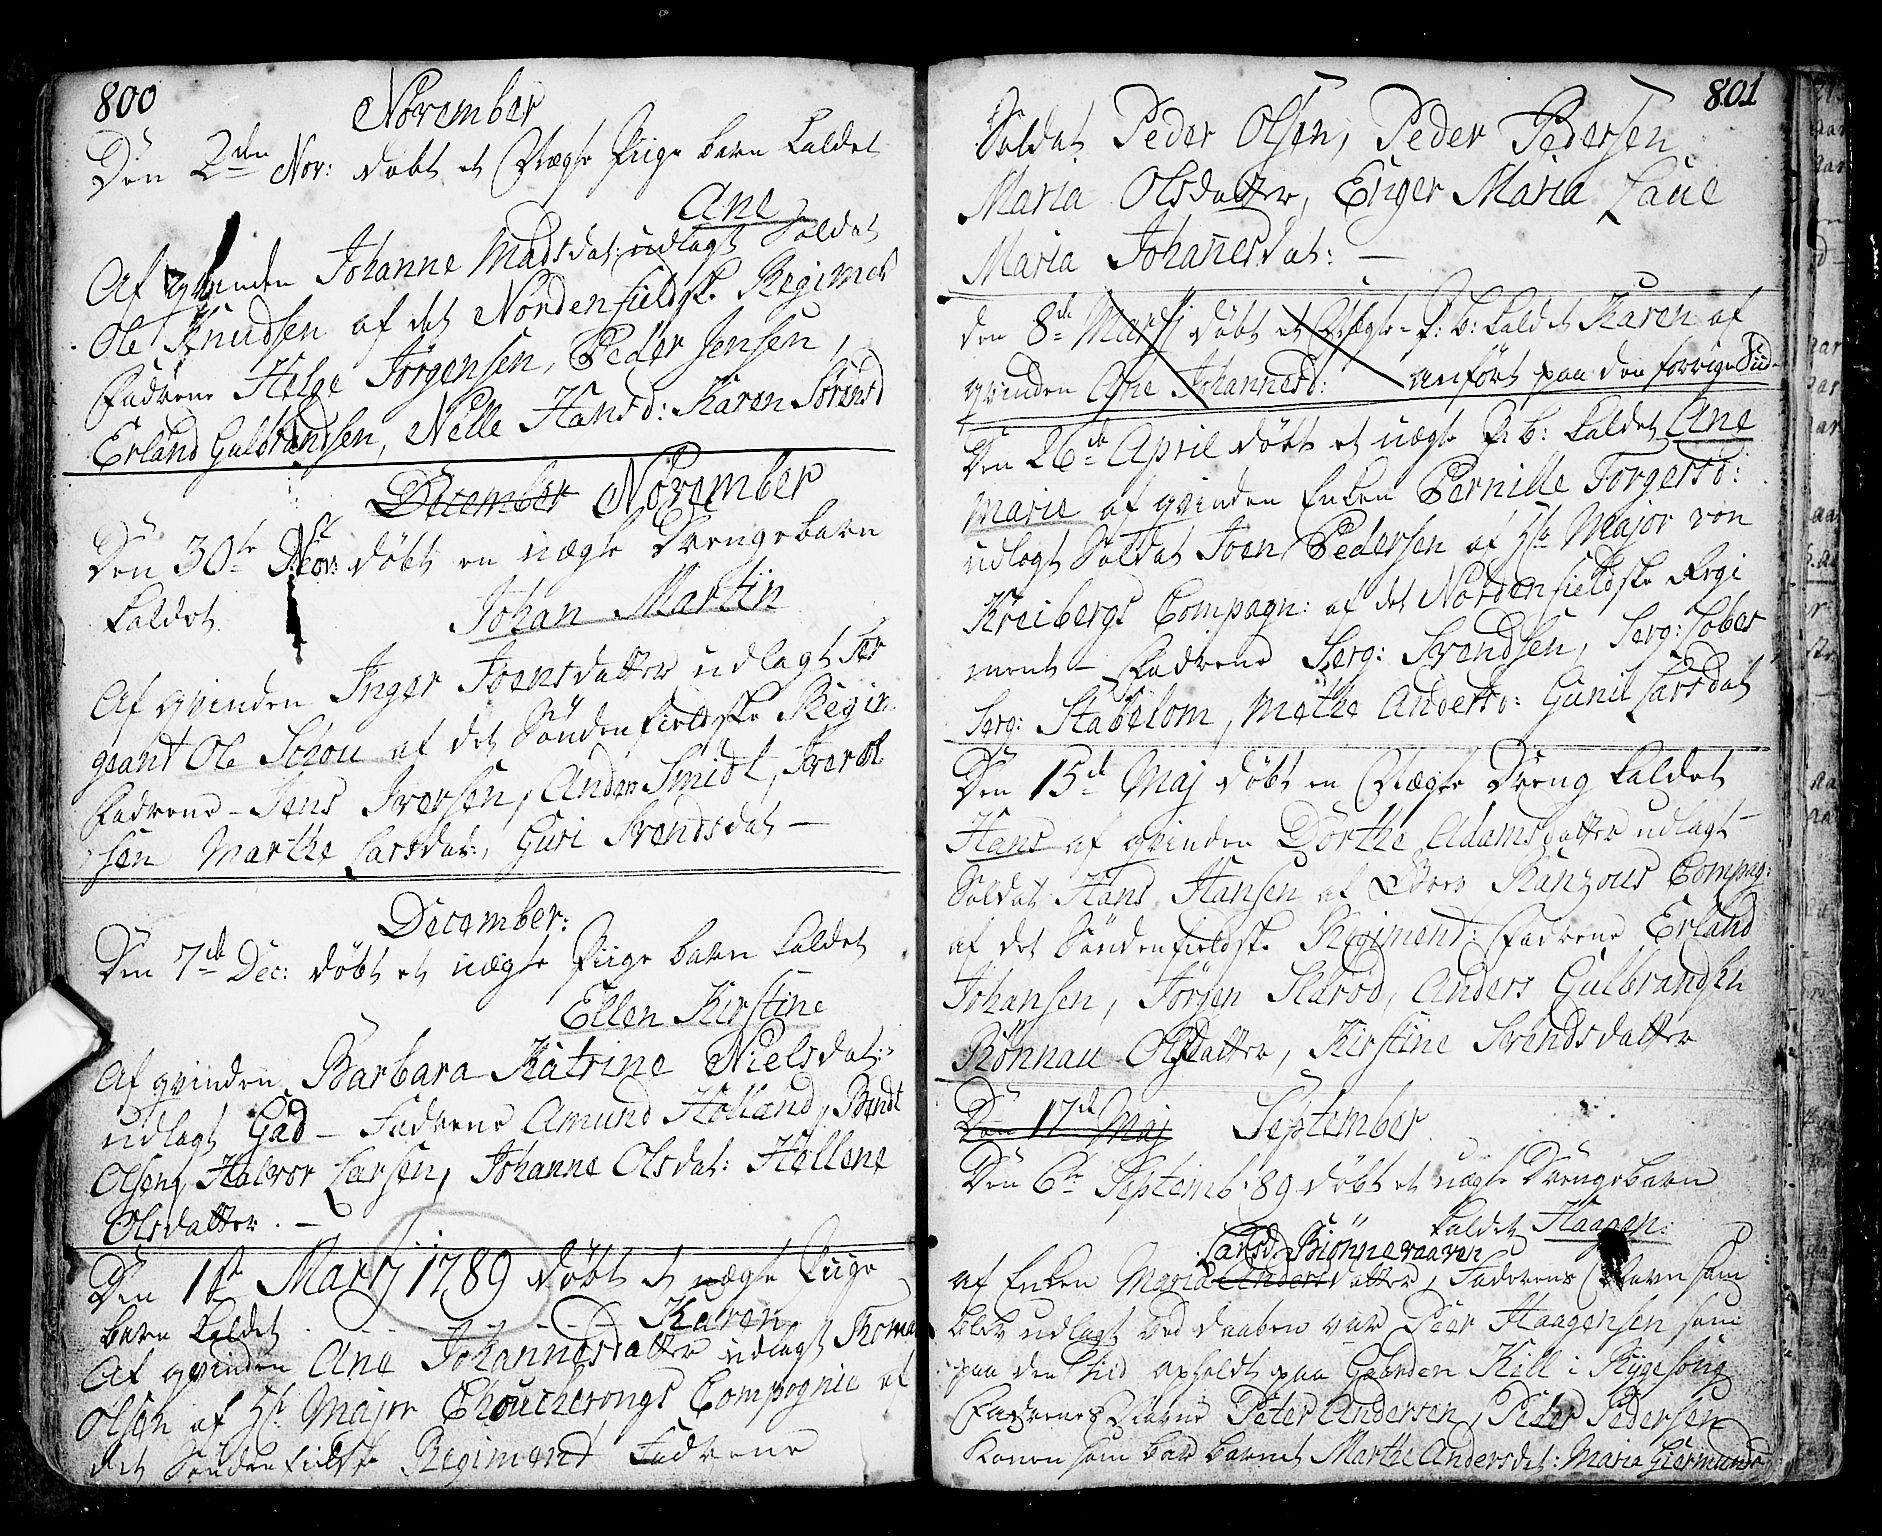 SAO, Fredrikstad prestekontor Kirkebøker, F/Fa/L0002: Parish register (official) no. 2, 1750-1804, p. 800-801